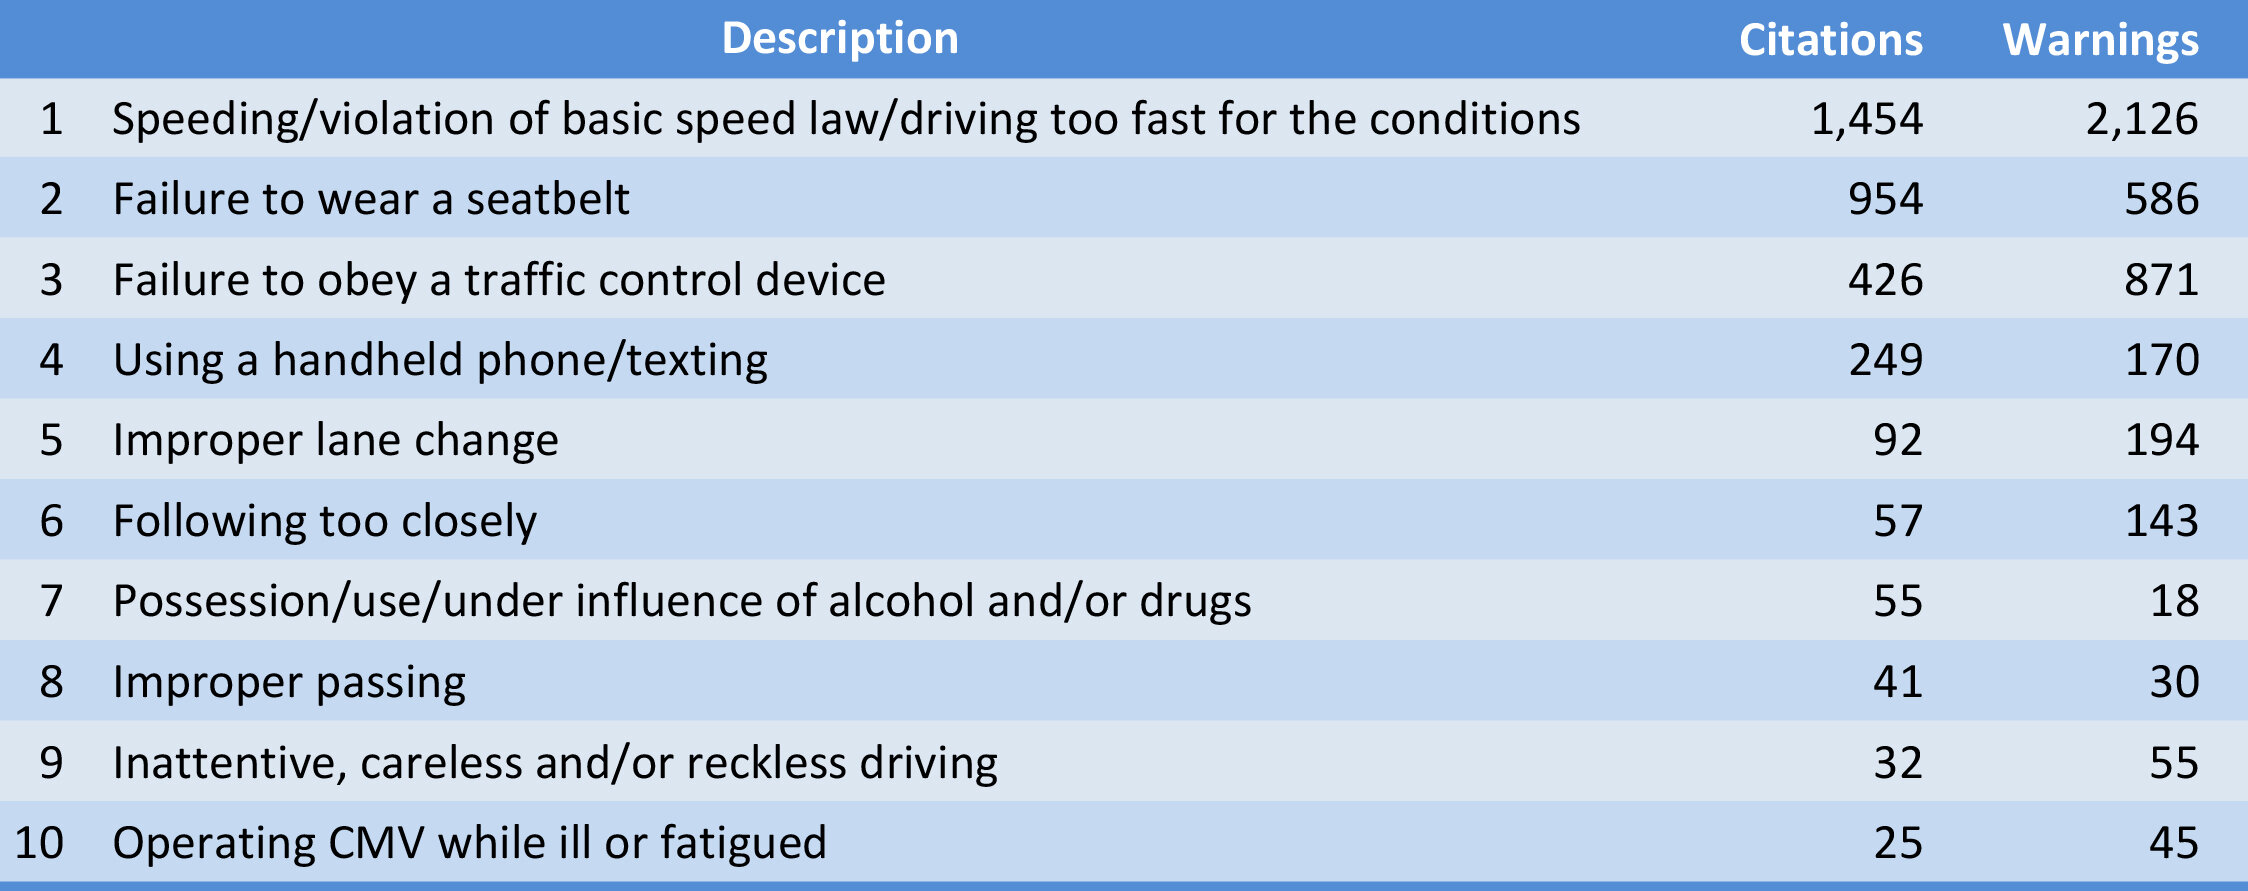 10 driver-behavior citations-warnings issued during 2019 .jpg